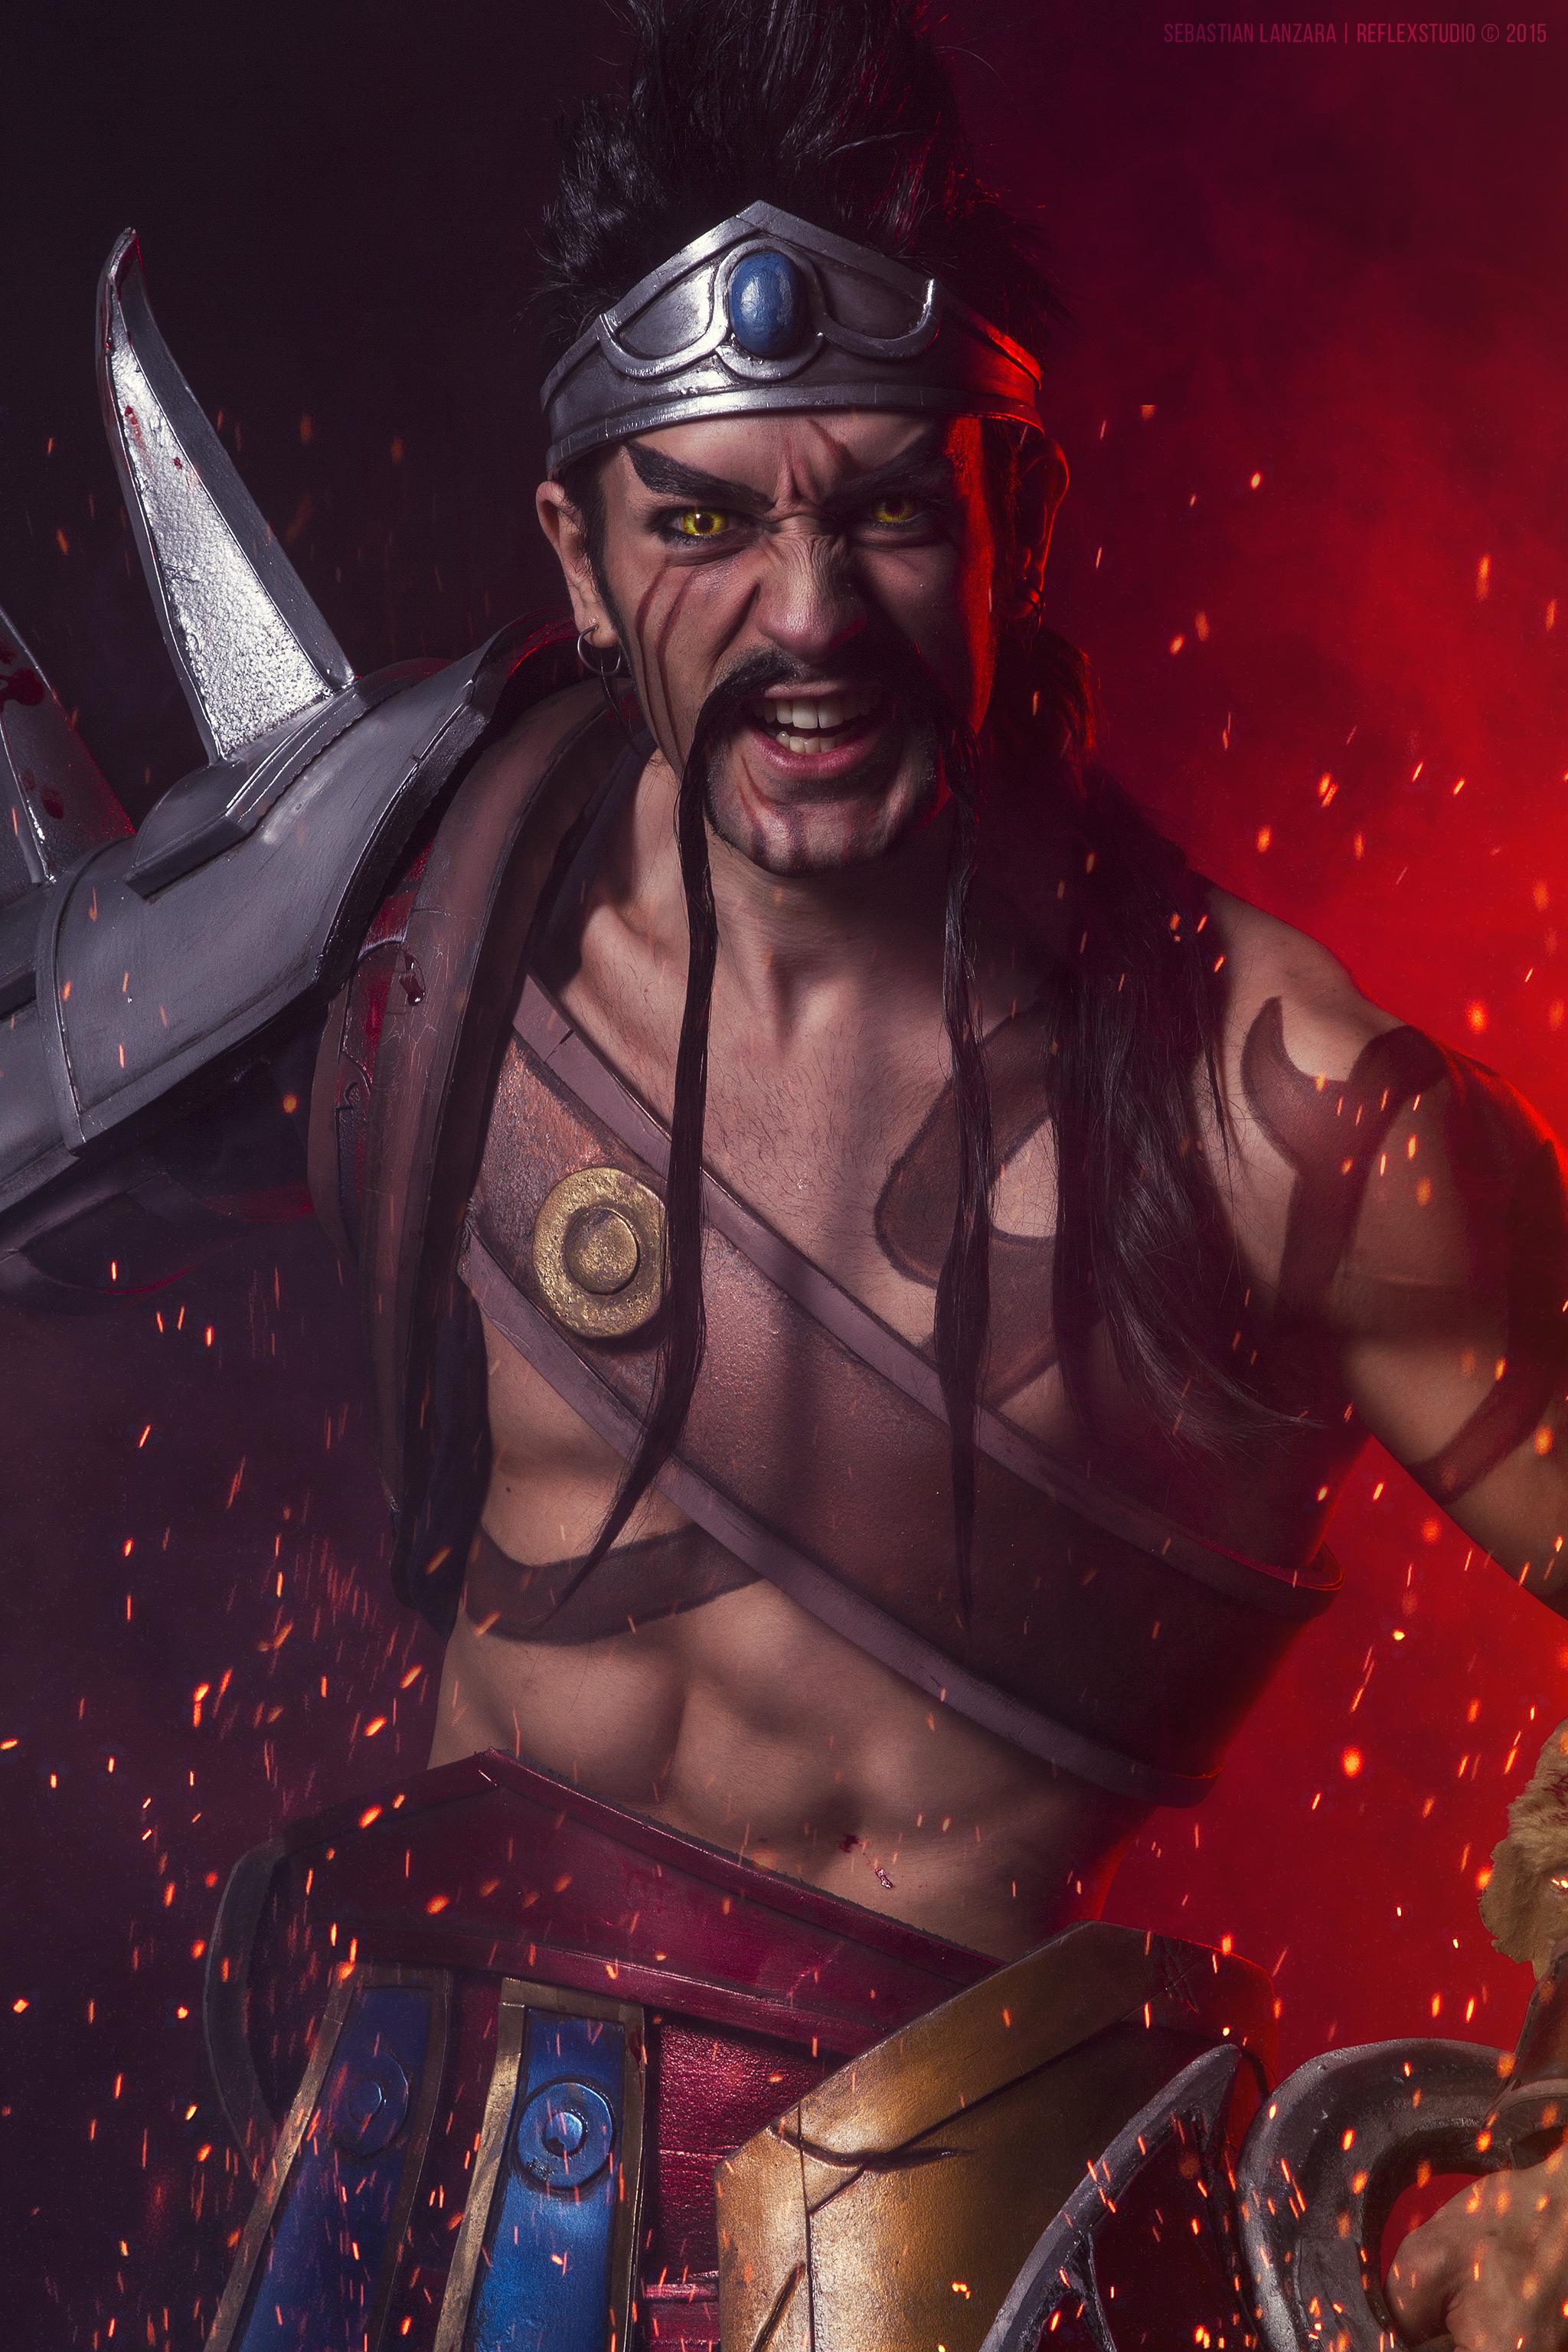 Gladiator Draven LOL - COSPLAY Art by Leon Chiro